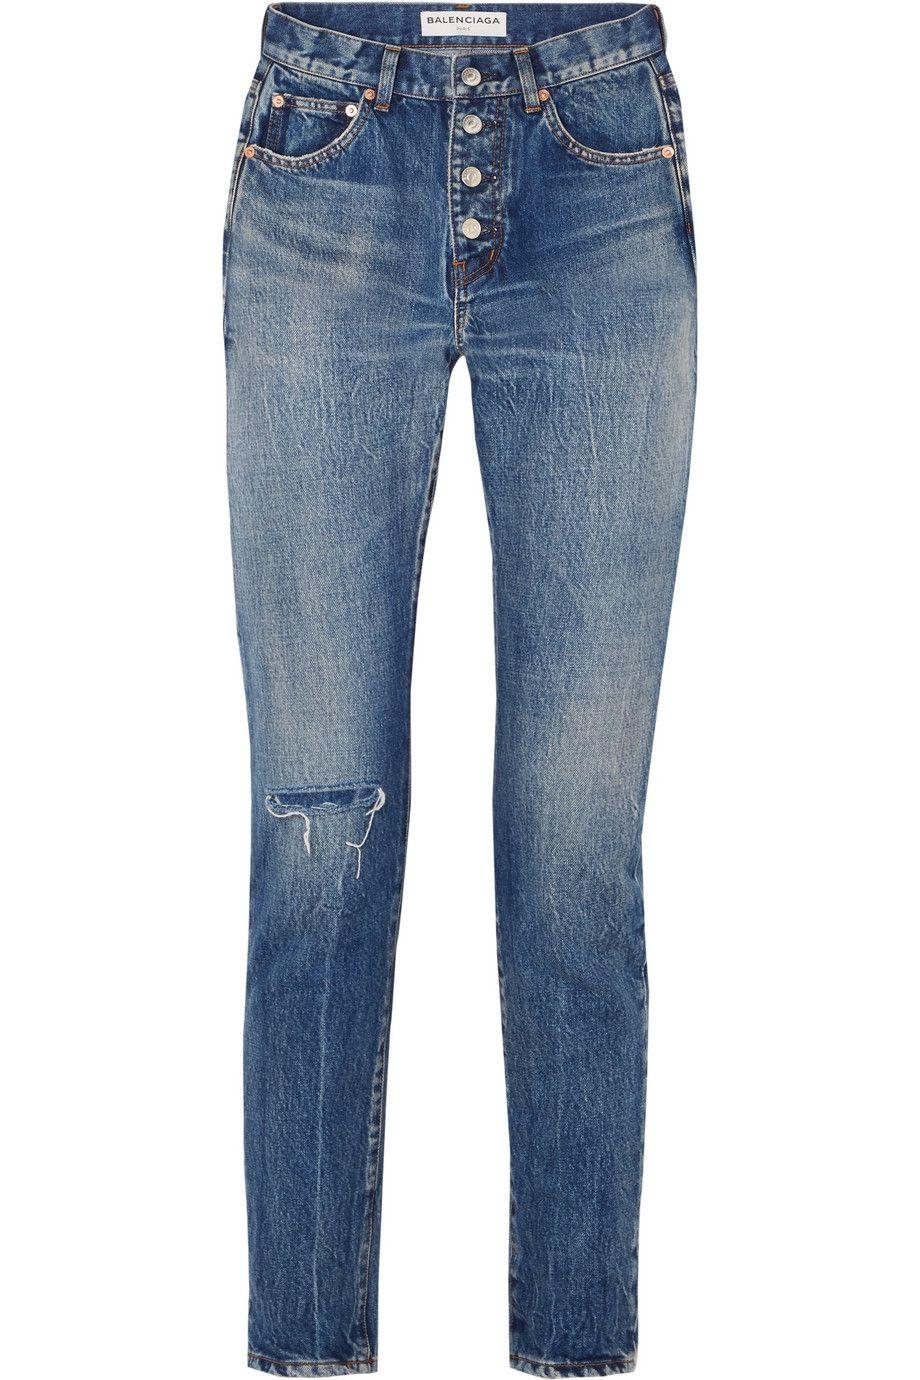 Net-A-Porter x Balenciaga Distressed mid-rise straight-leg jeans